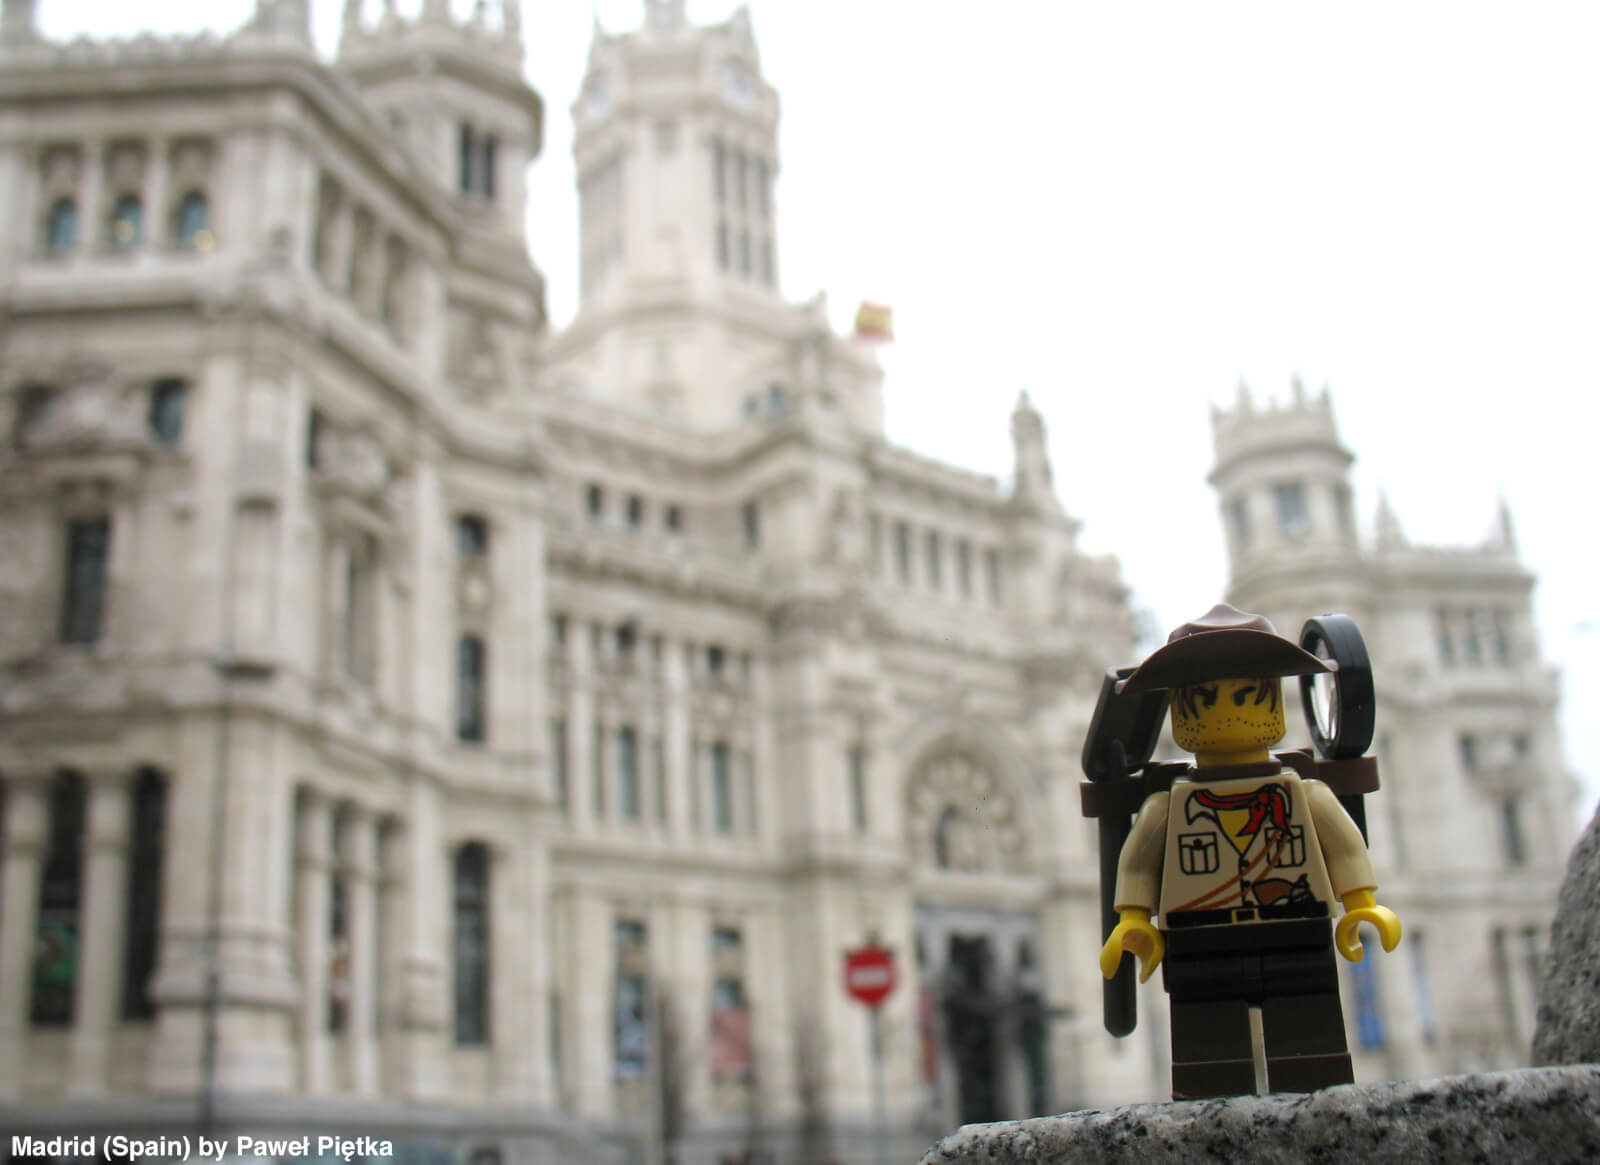 Madrid (Spain) - Cibeles Palace